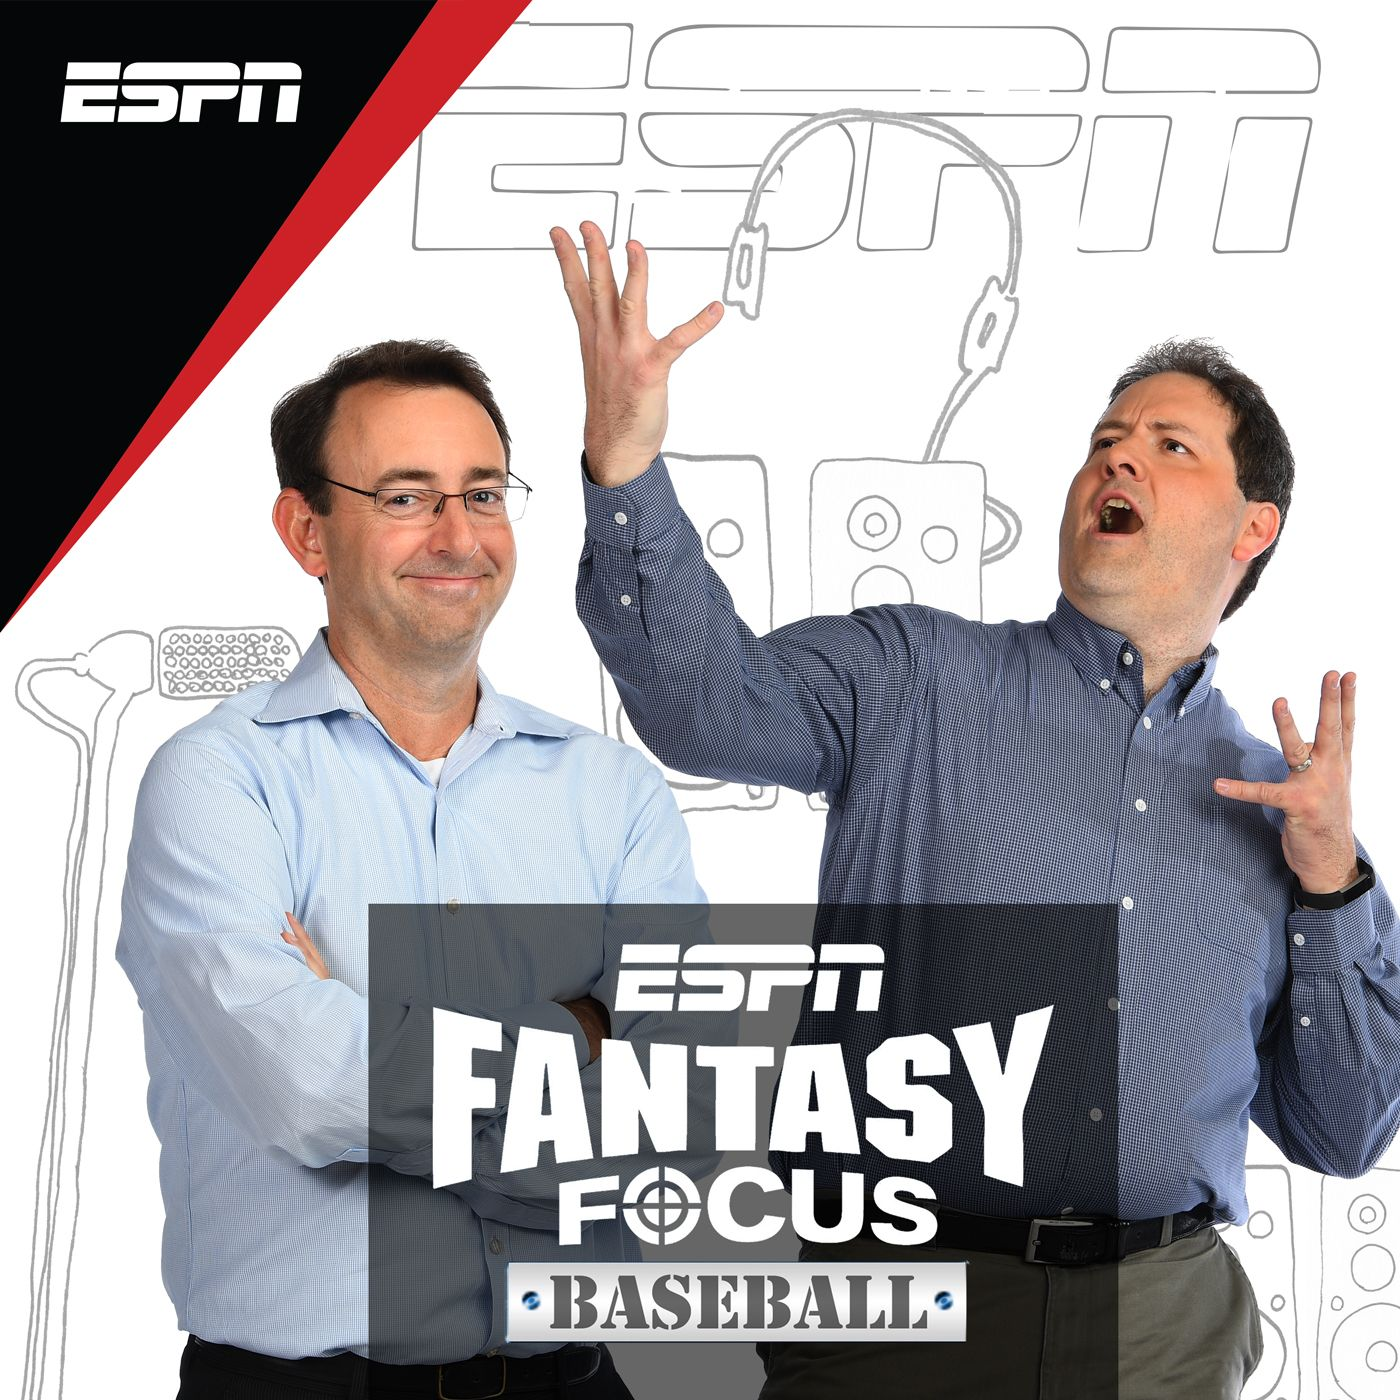 Fantasy Focus Baseball Podcast - Listen, Reviews, Charts